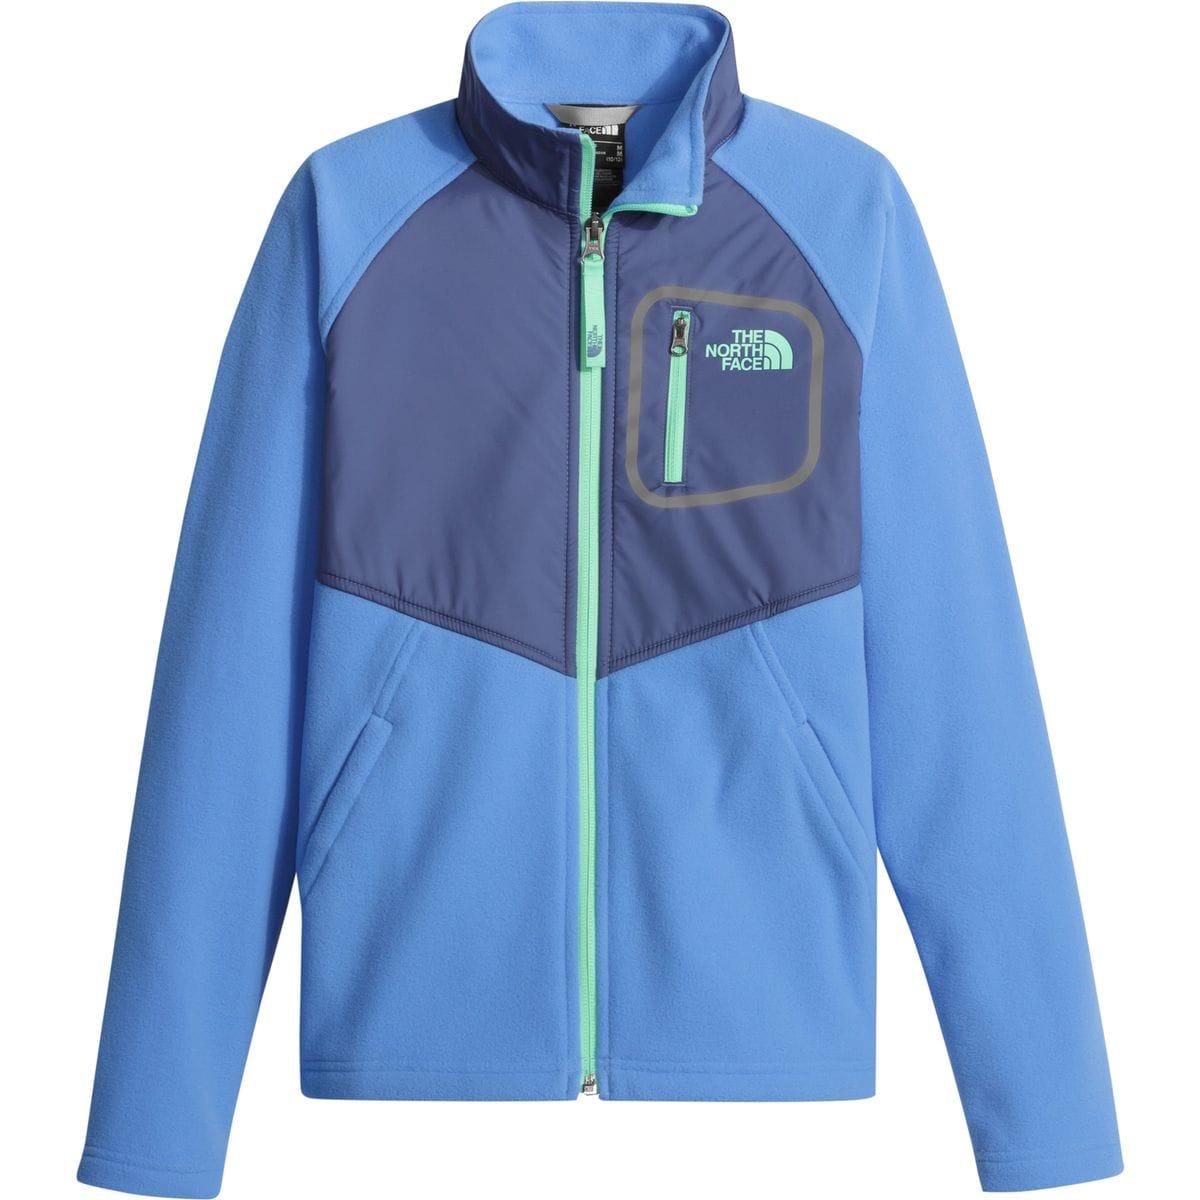 The North Face Glacier Track Jacket - Girls